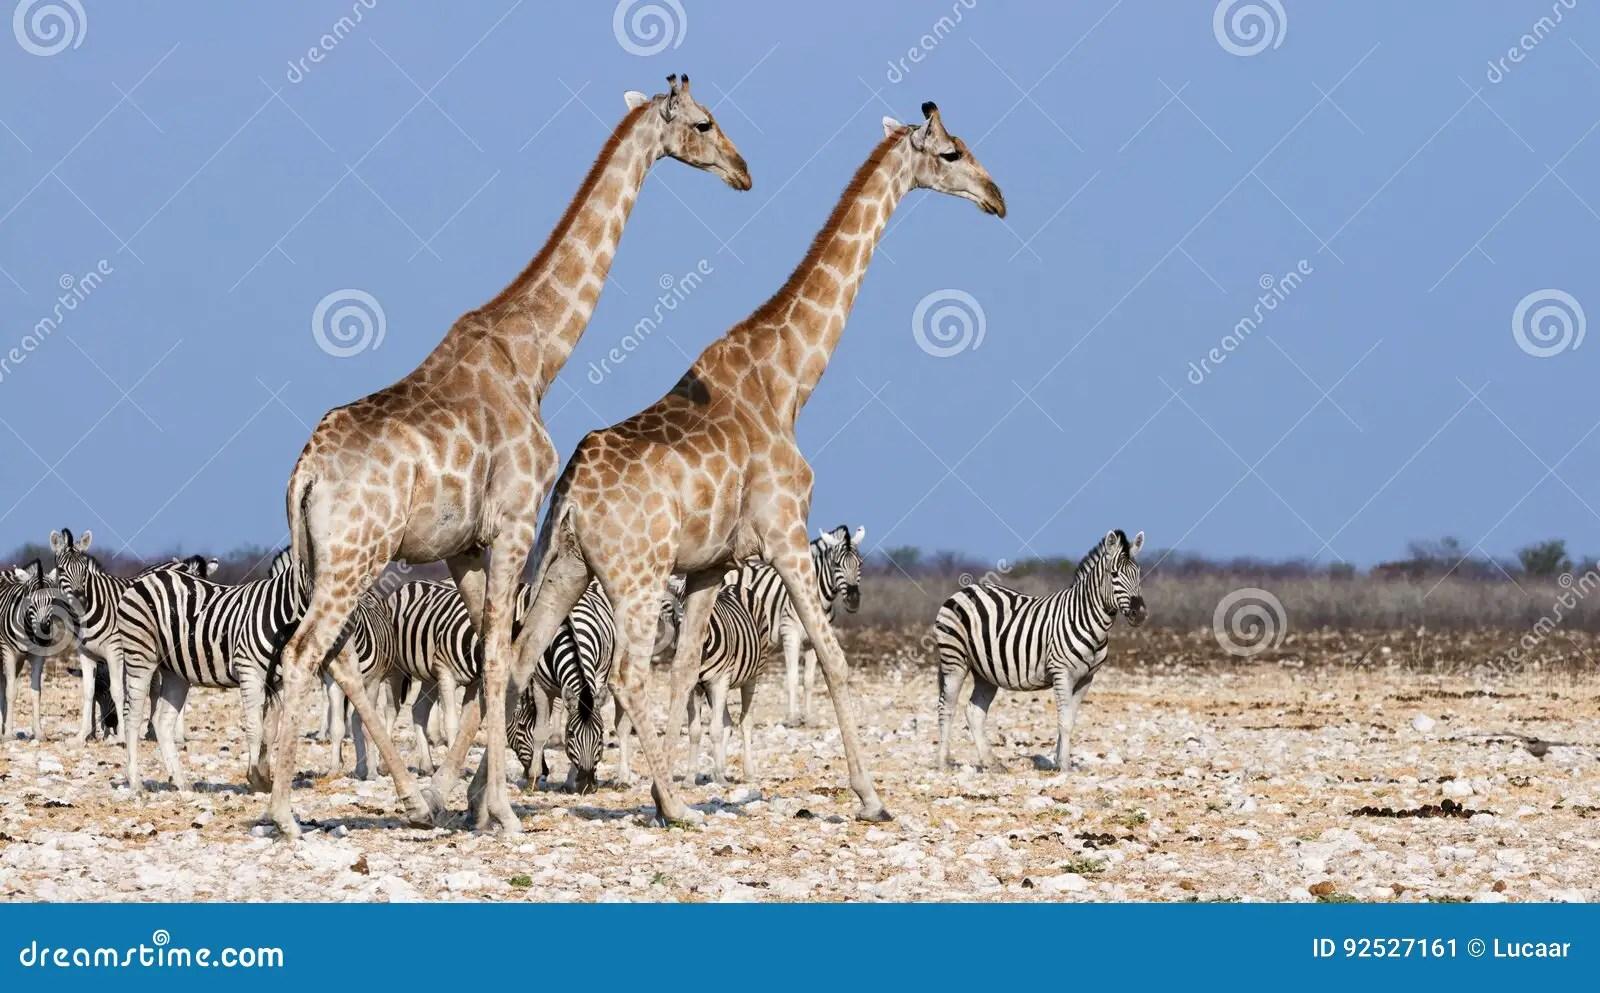 Giraffes And Zebras Stock Image Image Of Savanna Waiting